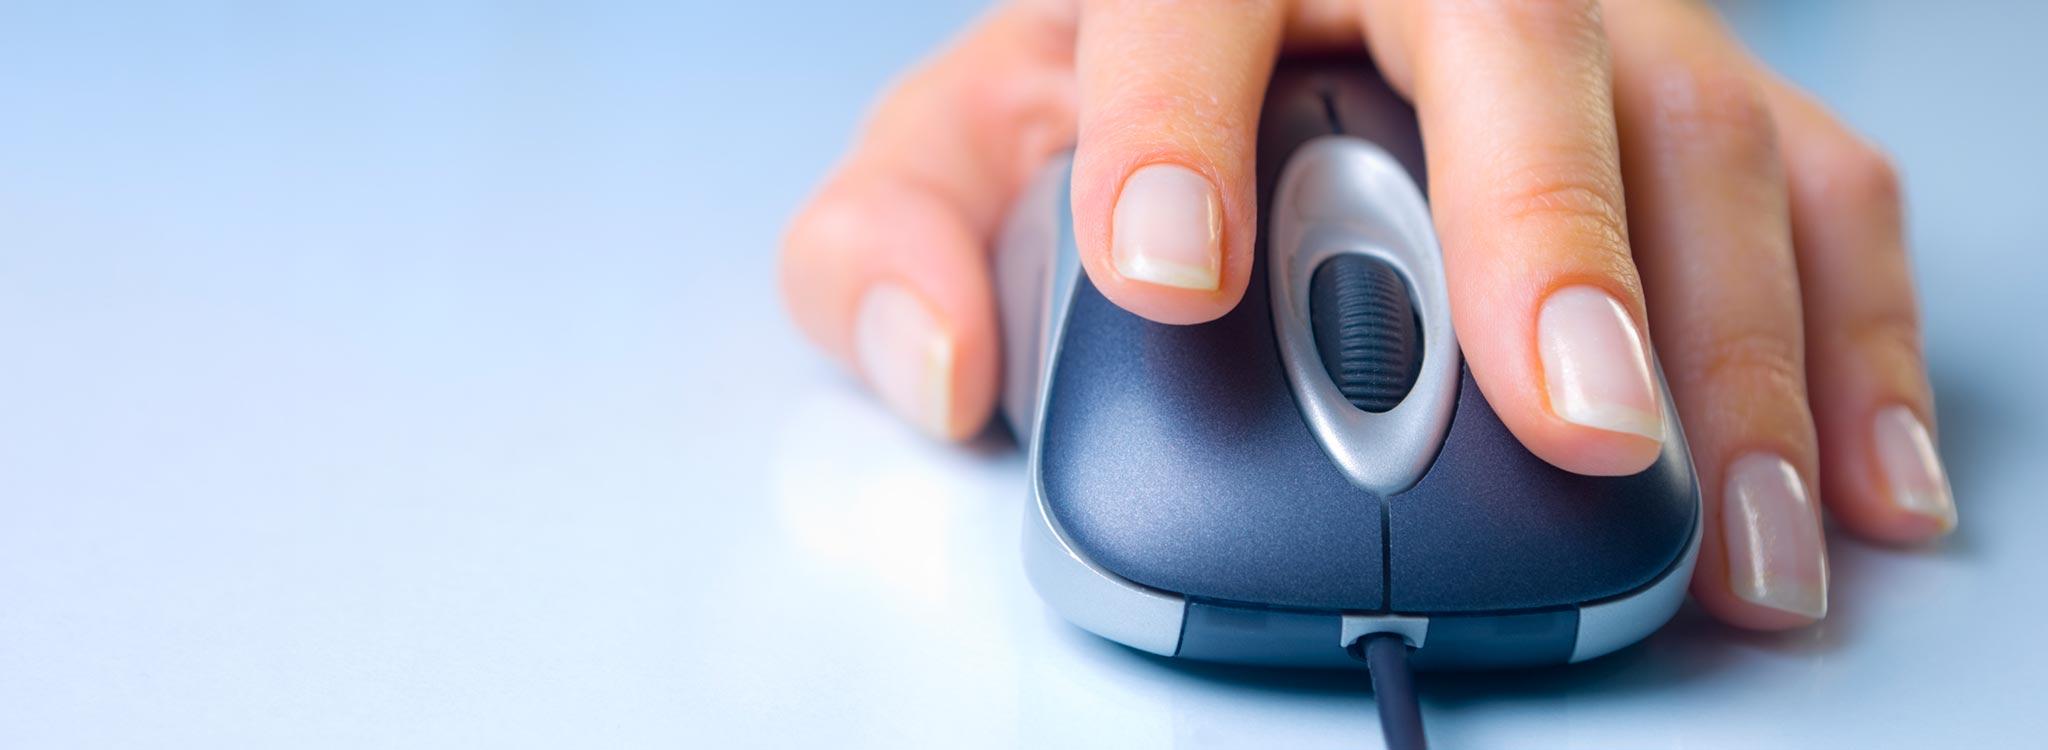 Software Support Consultant Manhattan Associates